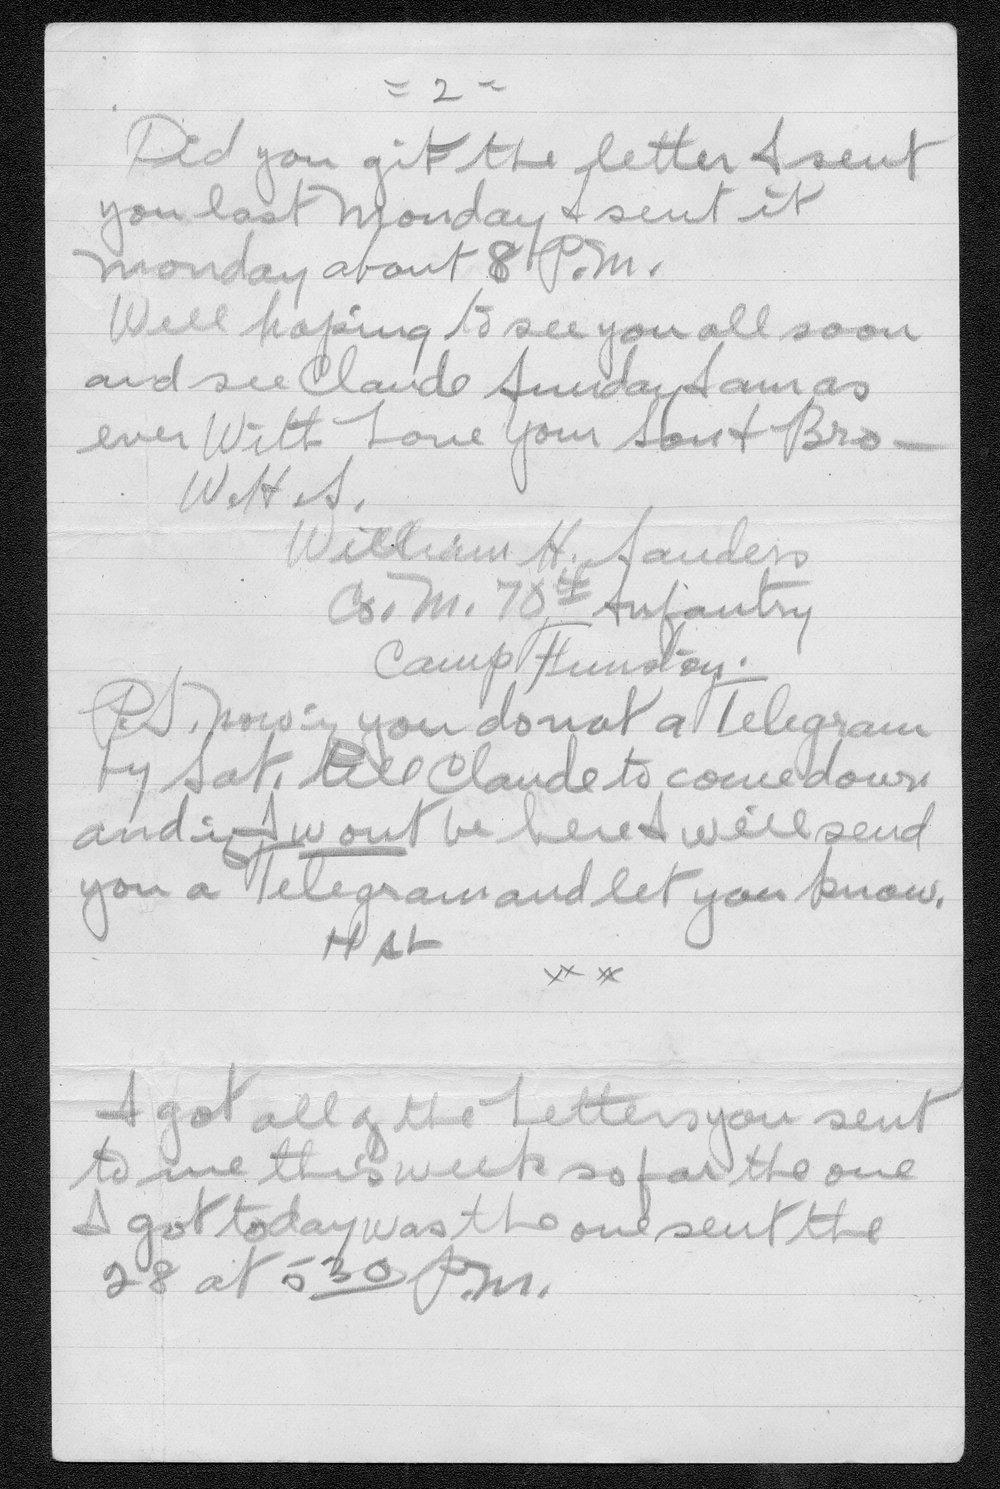 William Harold Sanders, World War I soldier - 10